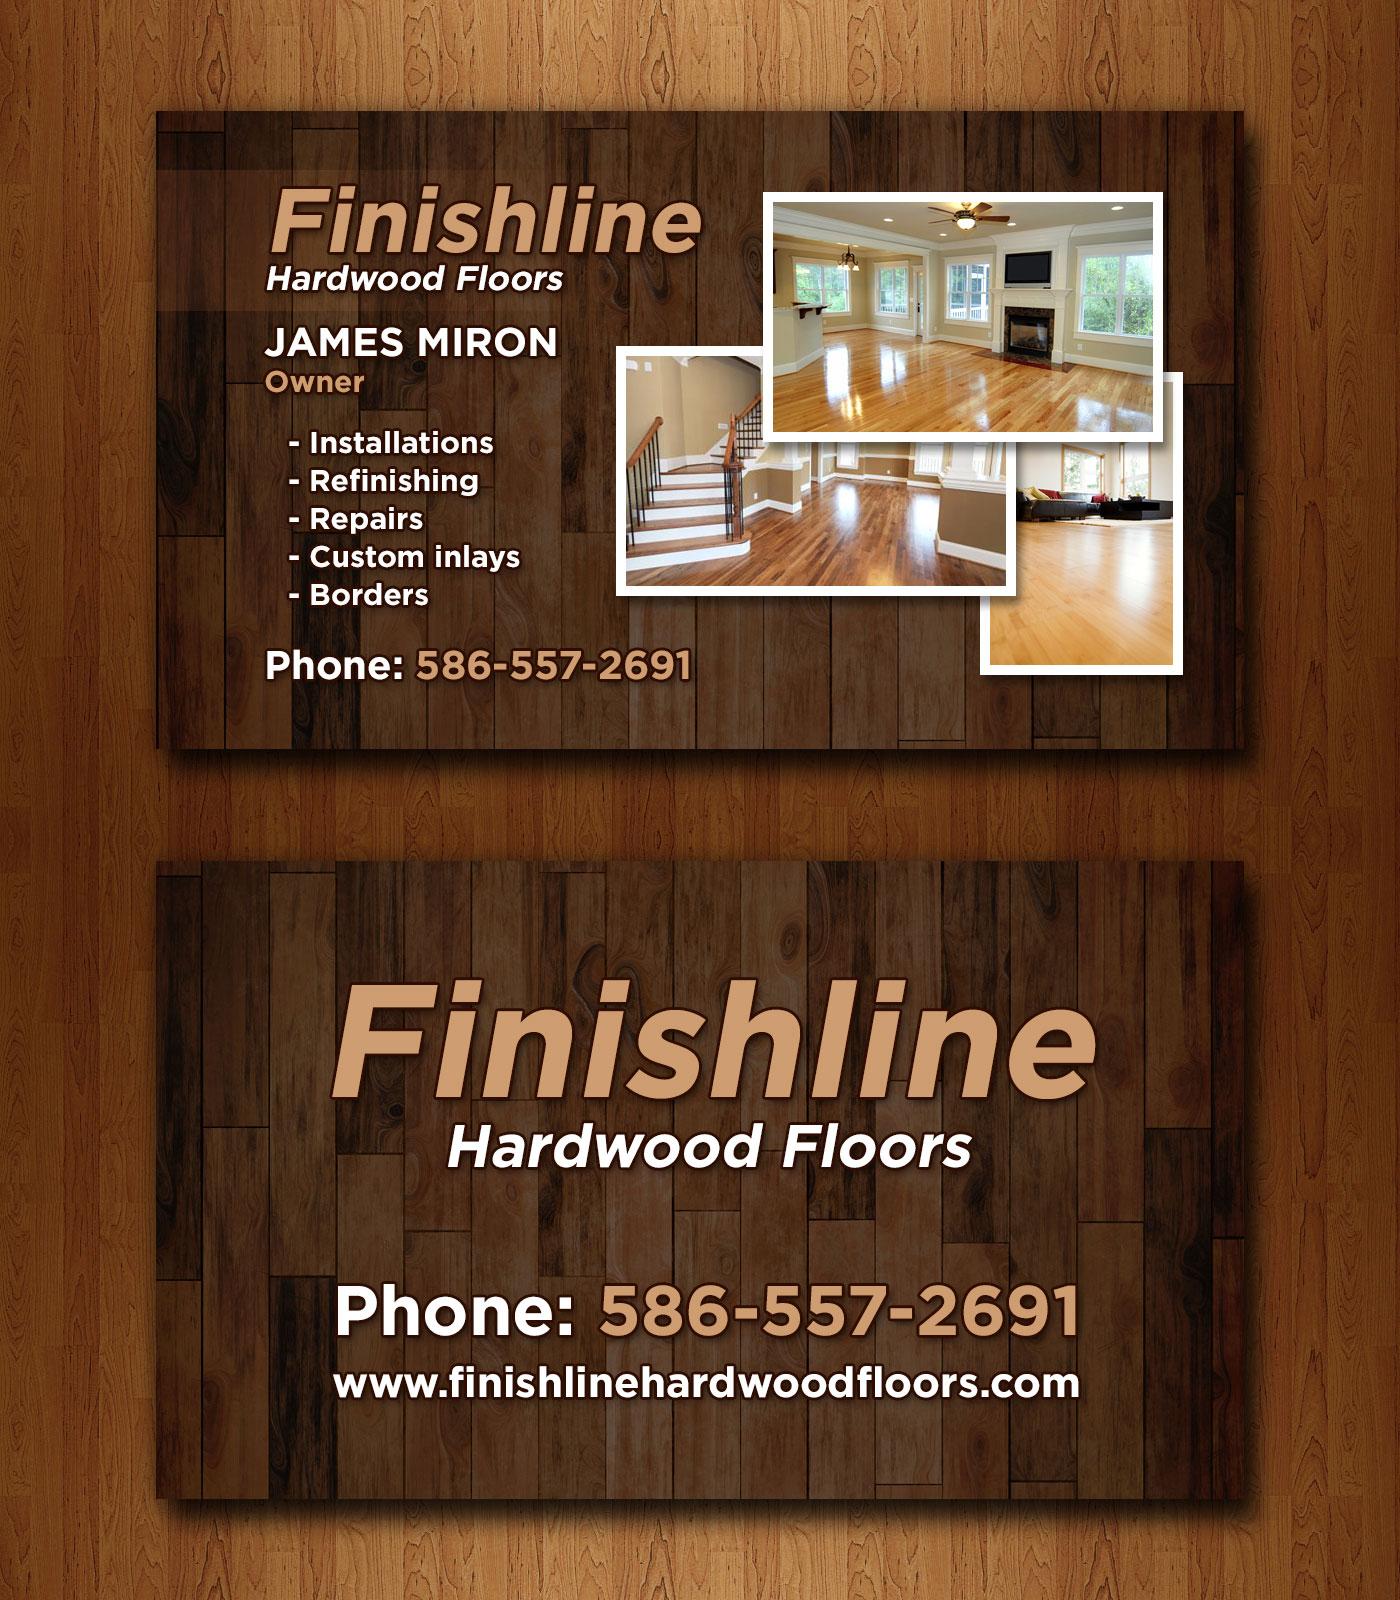 Flooring business cards floors doors interior design for Hardwood flooring company